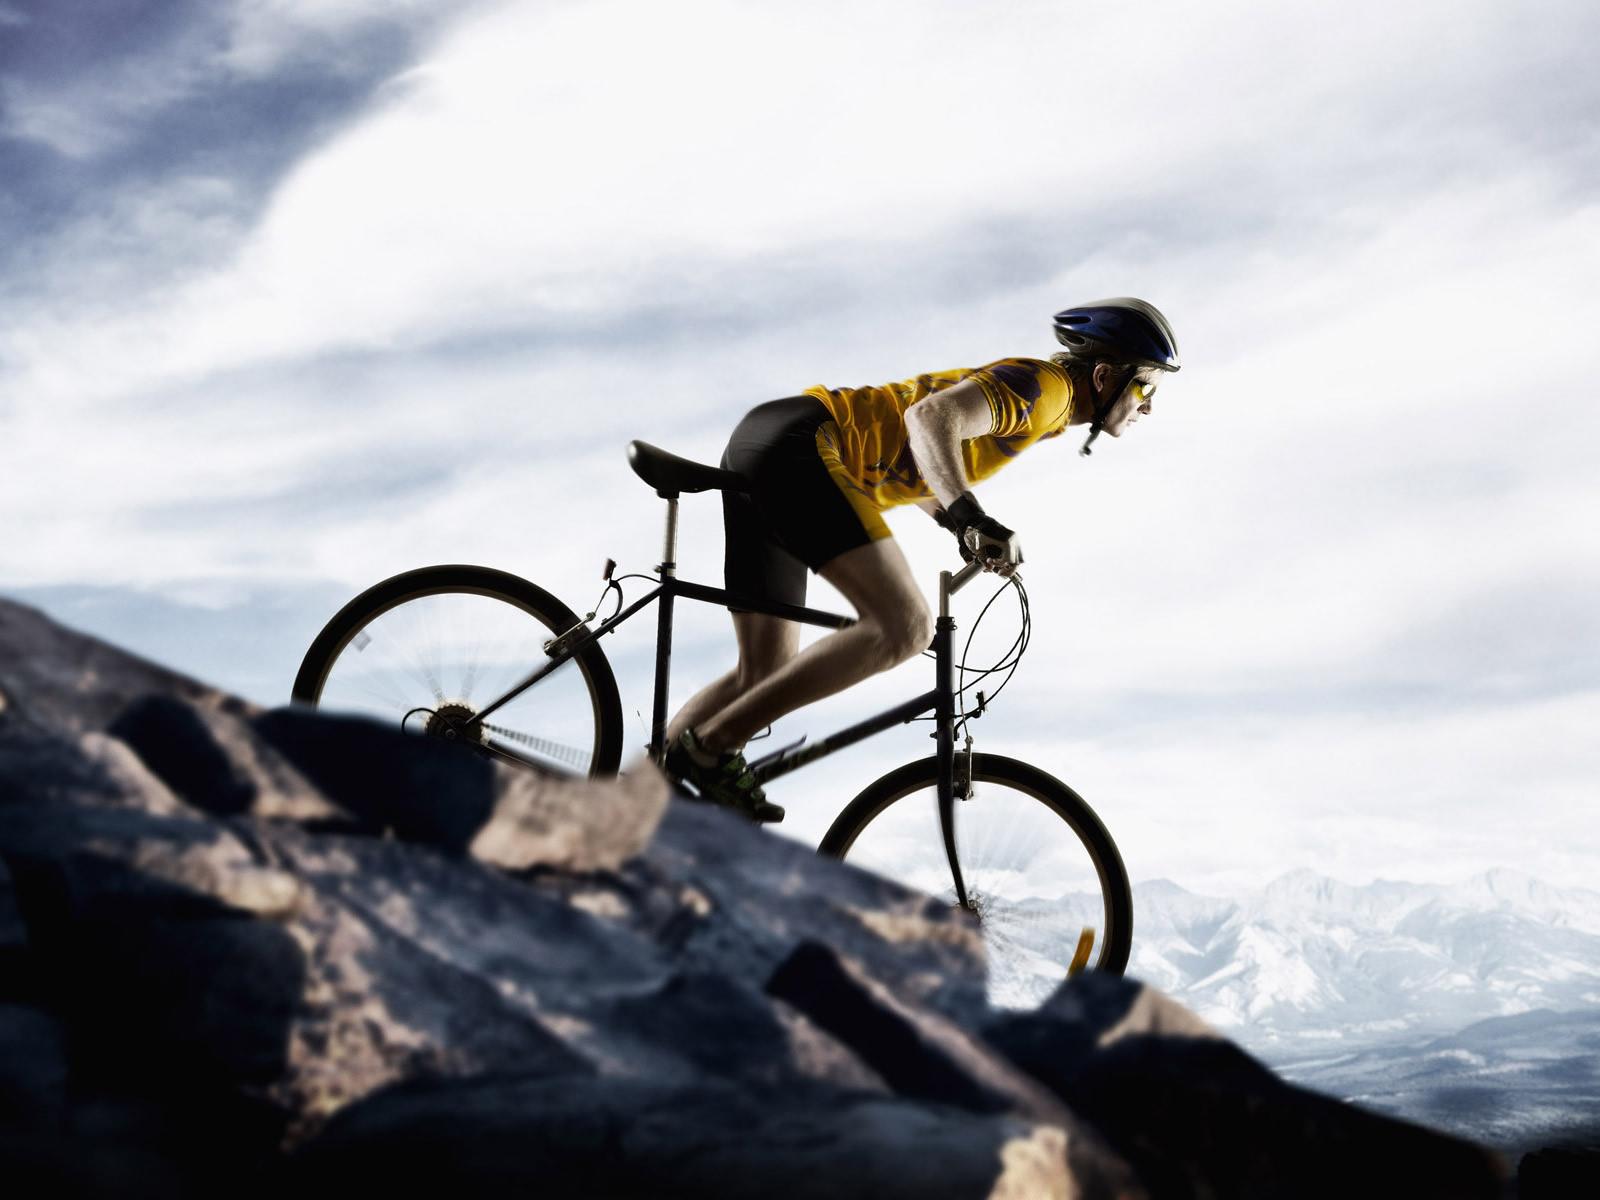 Download Mountain Biking 7333 1600x1200 Px High Definition Wallpaper